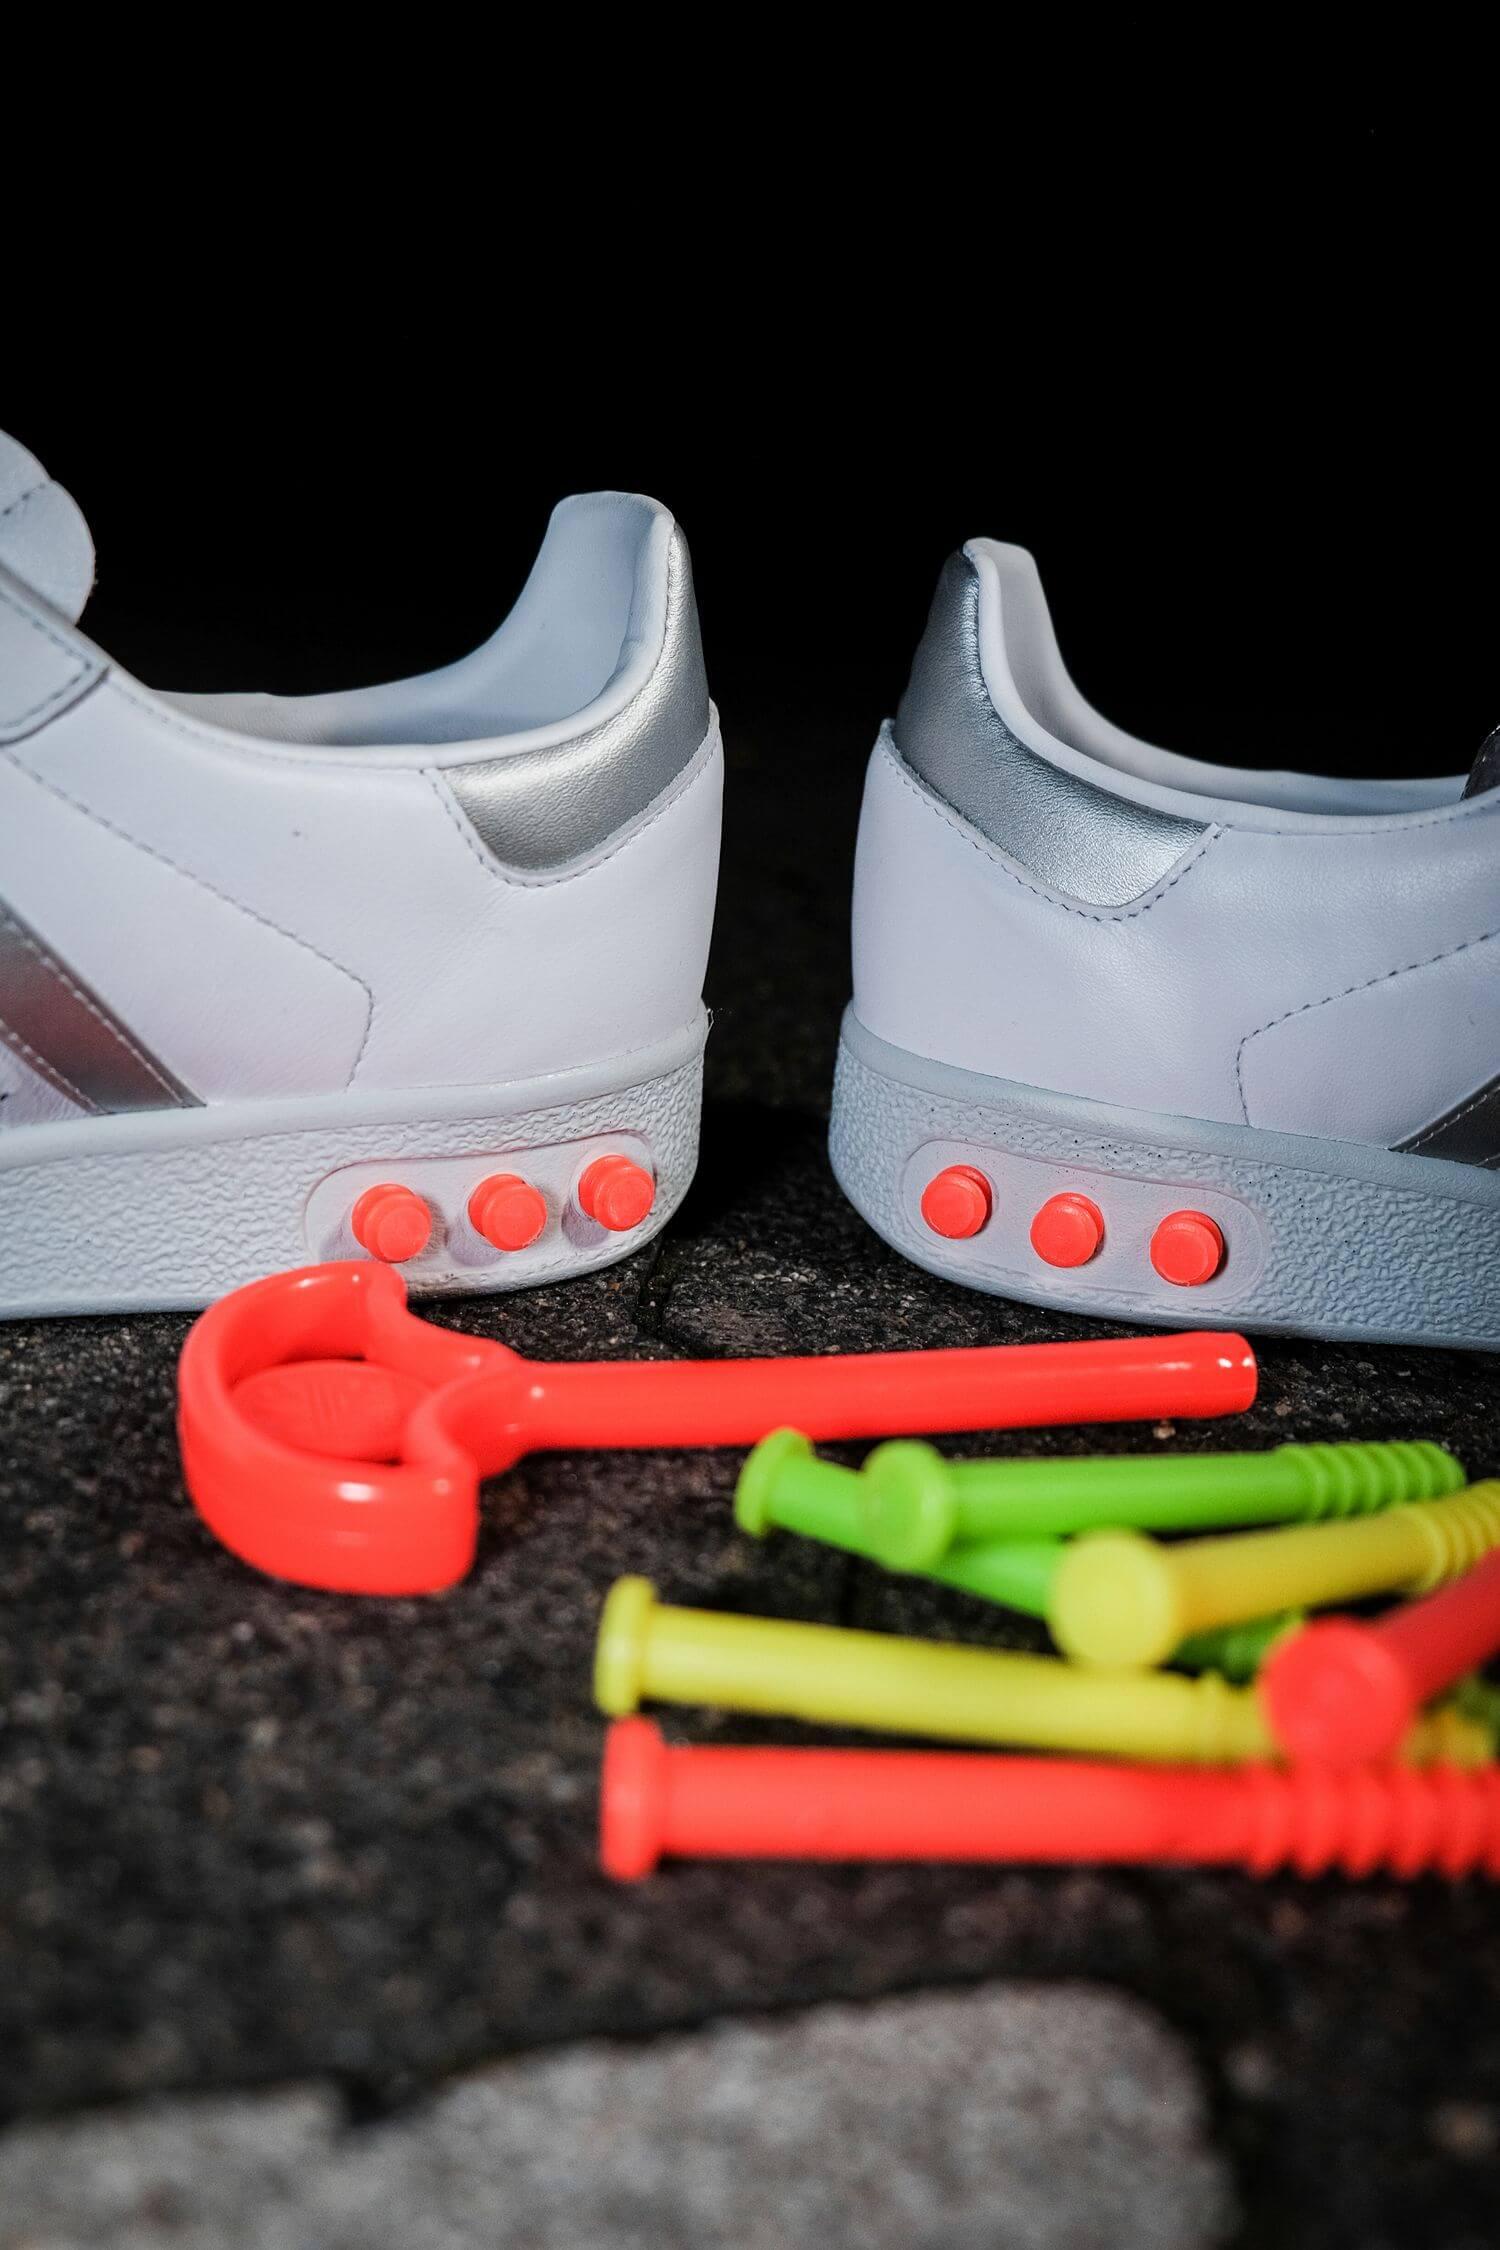 adidas - G.S. - cloud white/silver metallic/wonder white- H01818 - neon orange plug tool and plugs